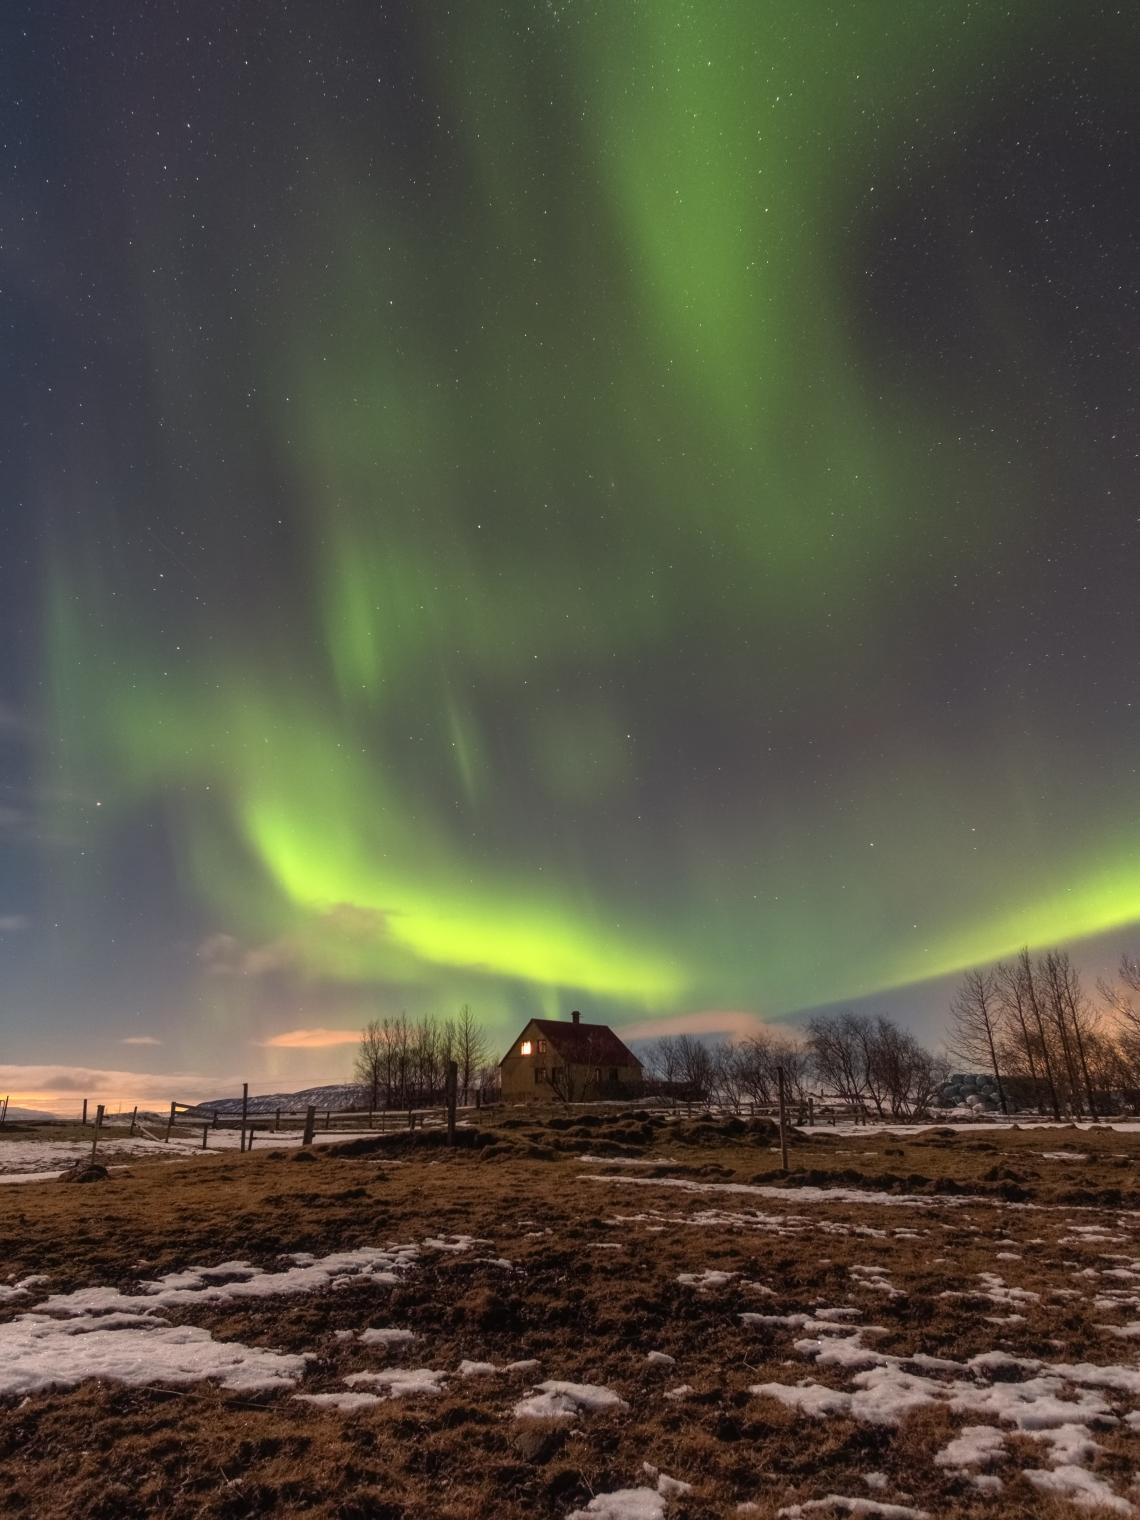 Island Februar 2019 jpegs (6)